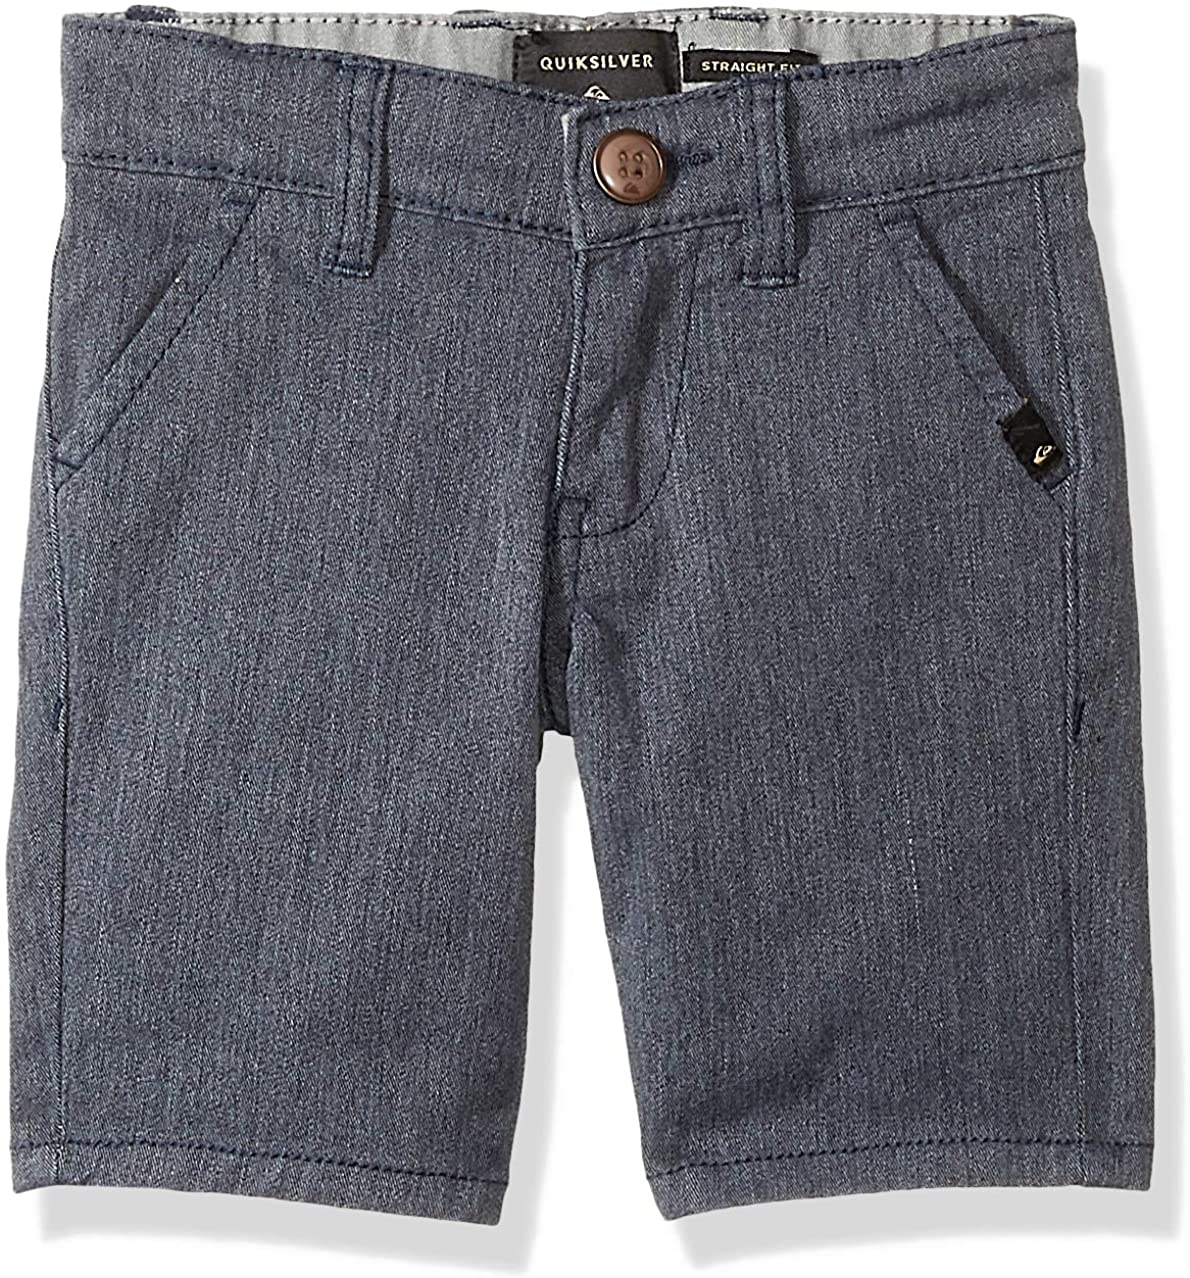 Quiksilver Little Everyday Union Stretch Aw Boy Walk Shorts